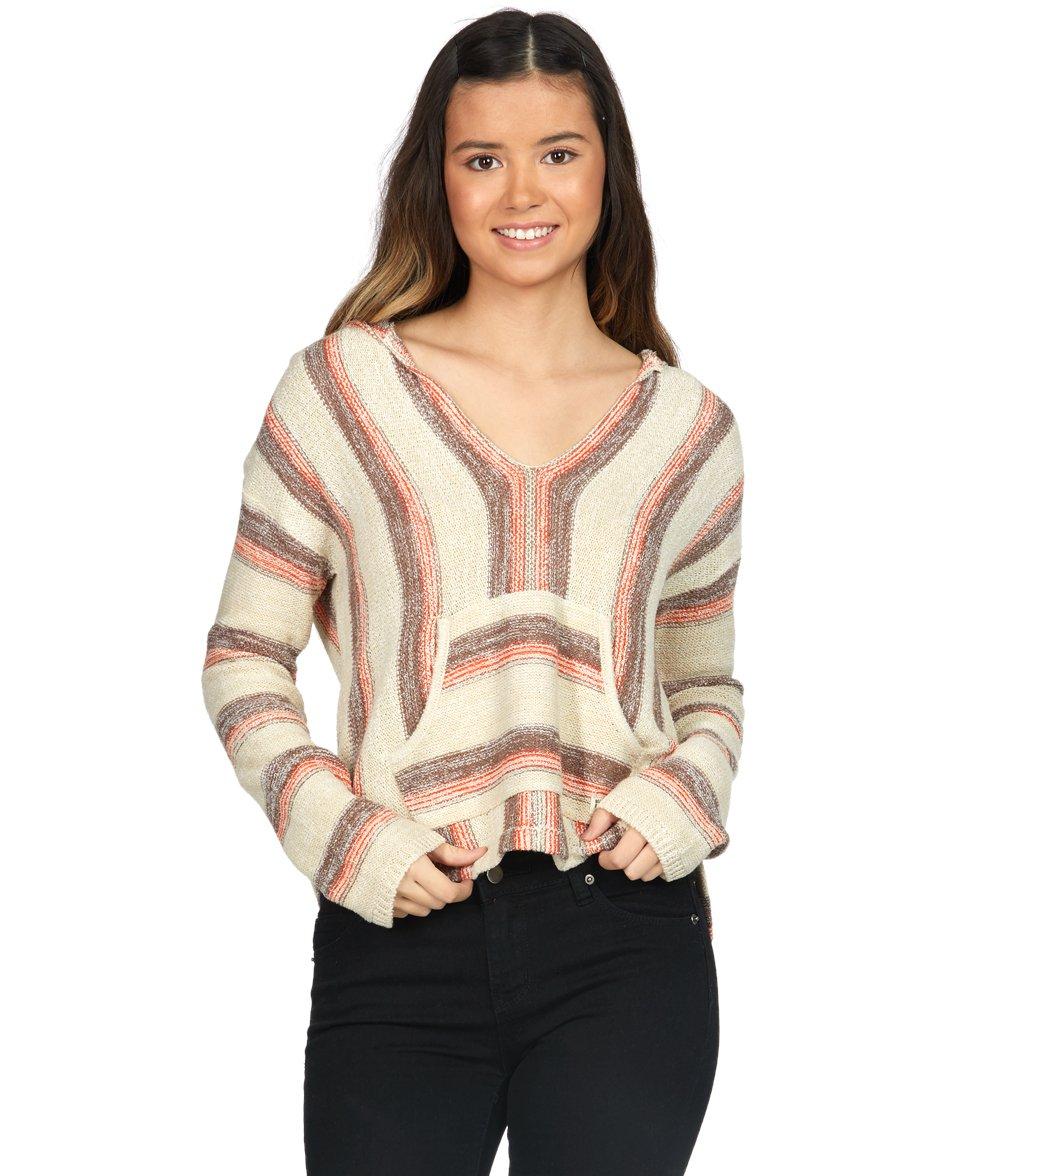 3927174963 Billabong Women's Baja Beach Hooded Pullover Sweater at SwimOutlet.com -  Free Shipping